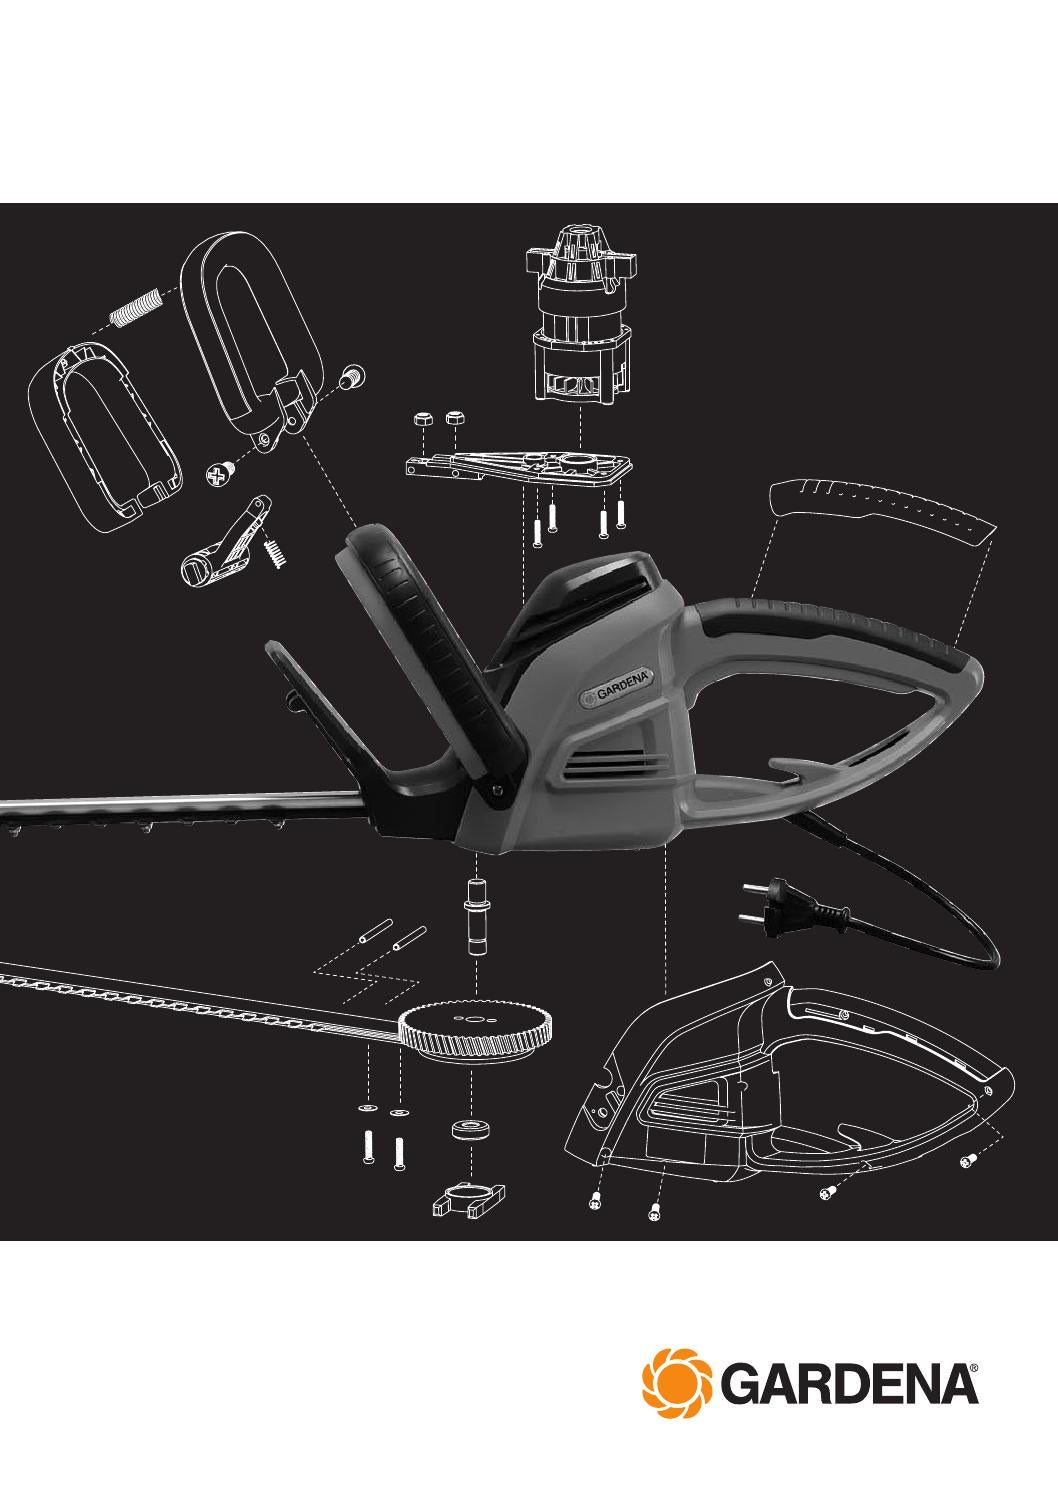 gardena - spare parts 2013 by husqvarna ab - issuu